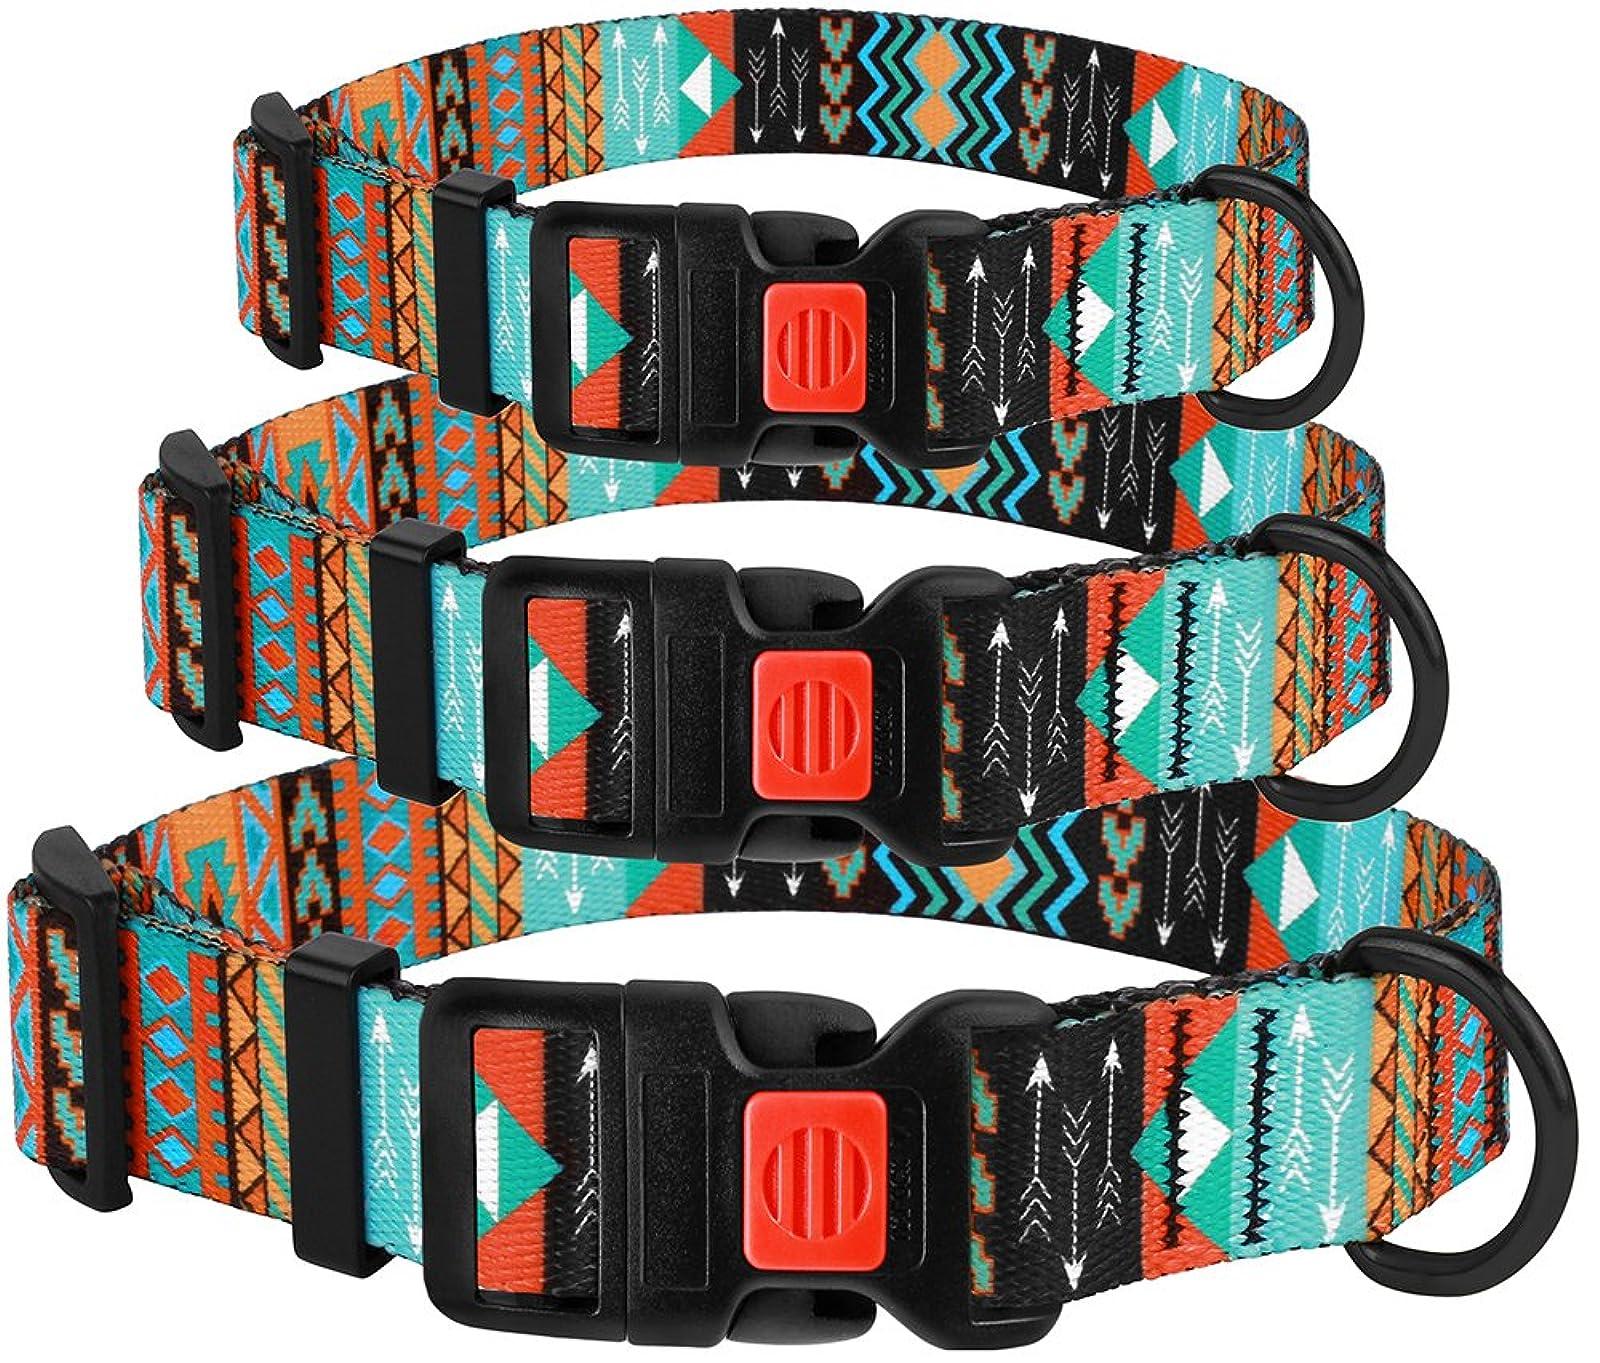 CollarDirect Nylon Dog Collar with Buckle Tribal - 6